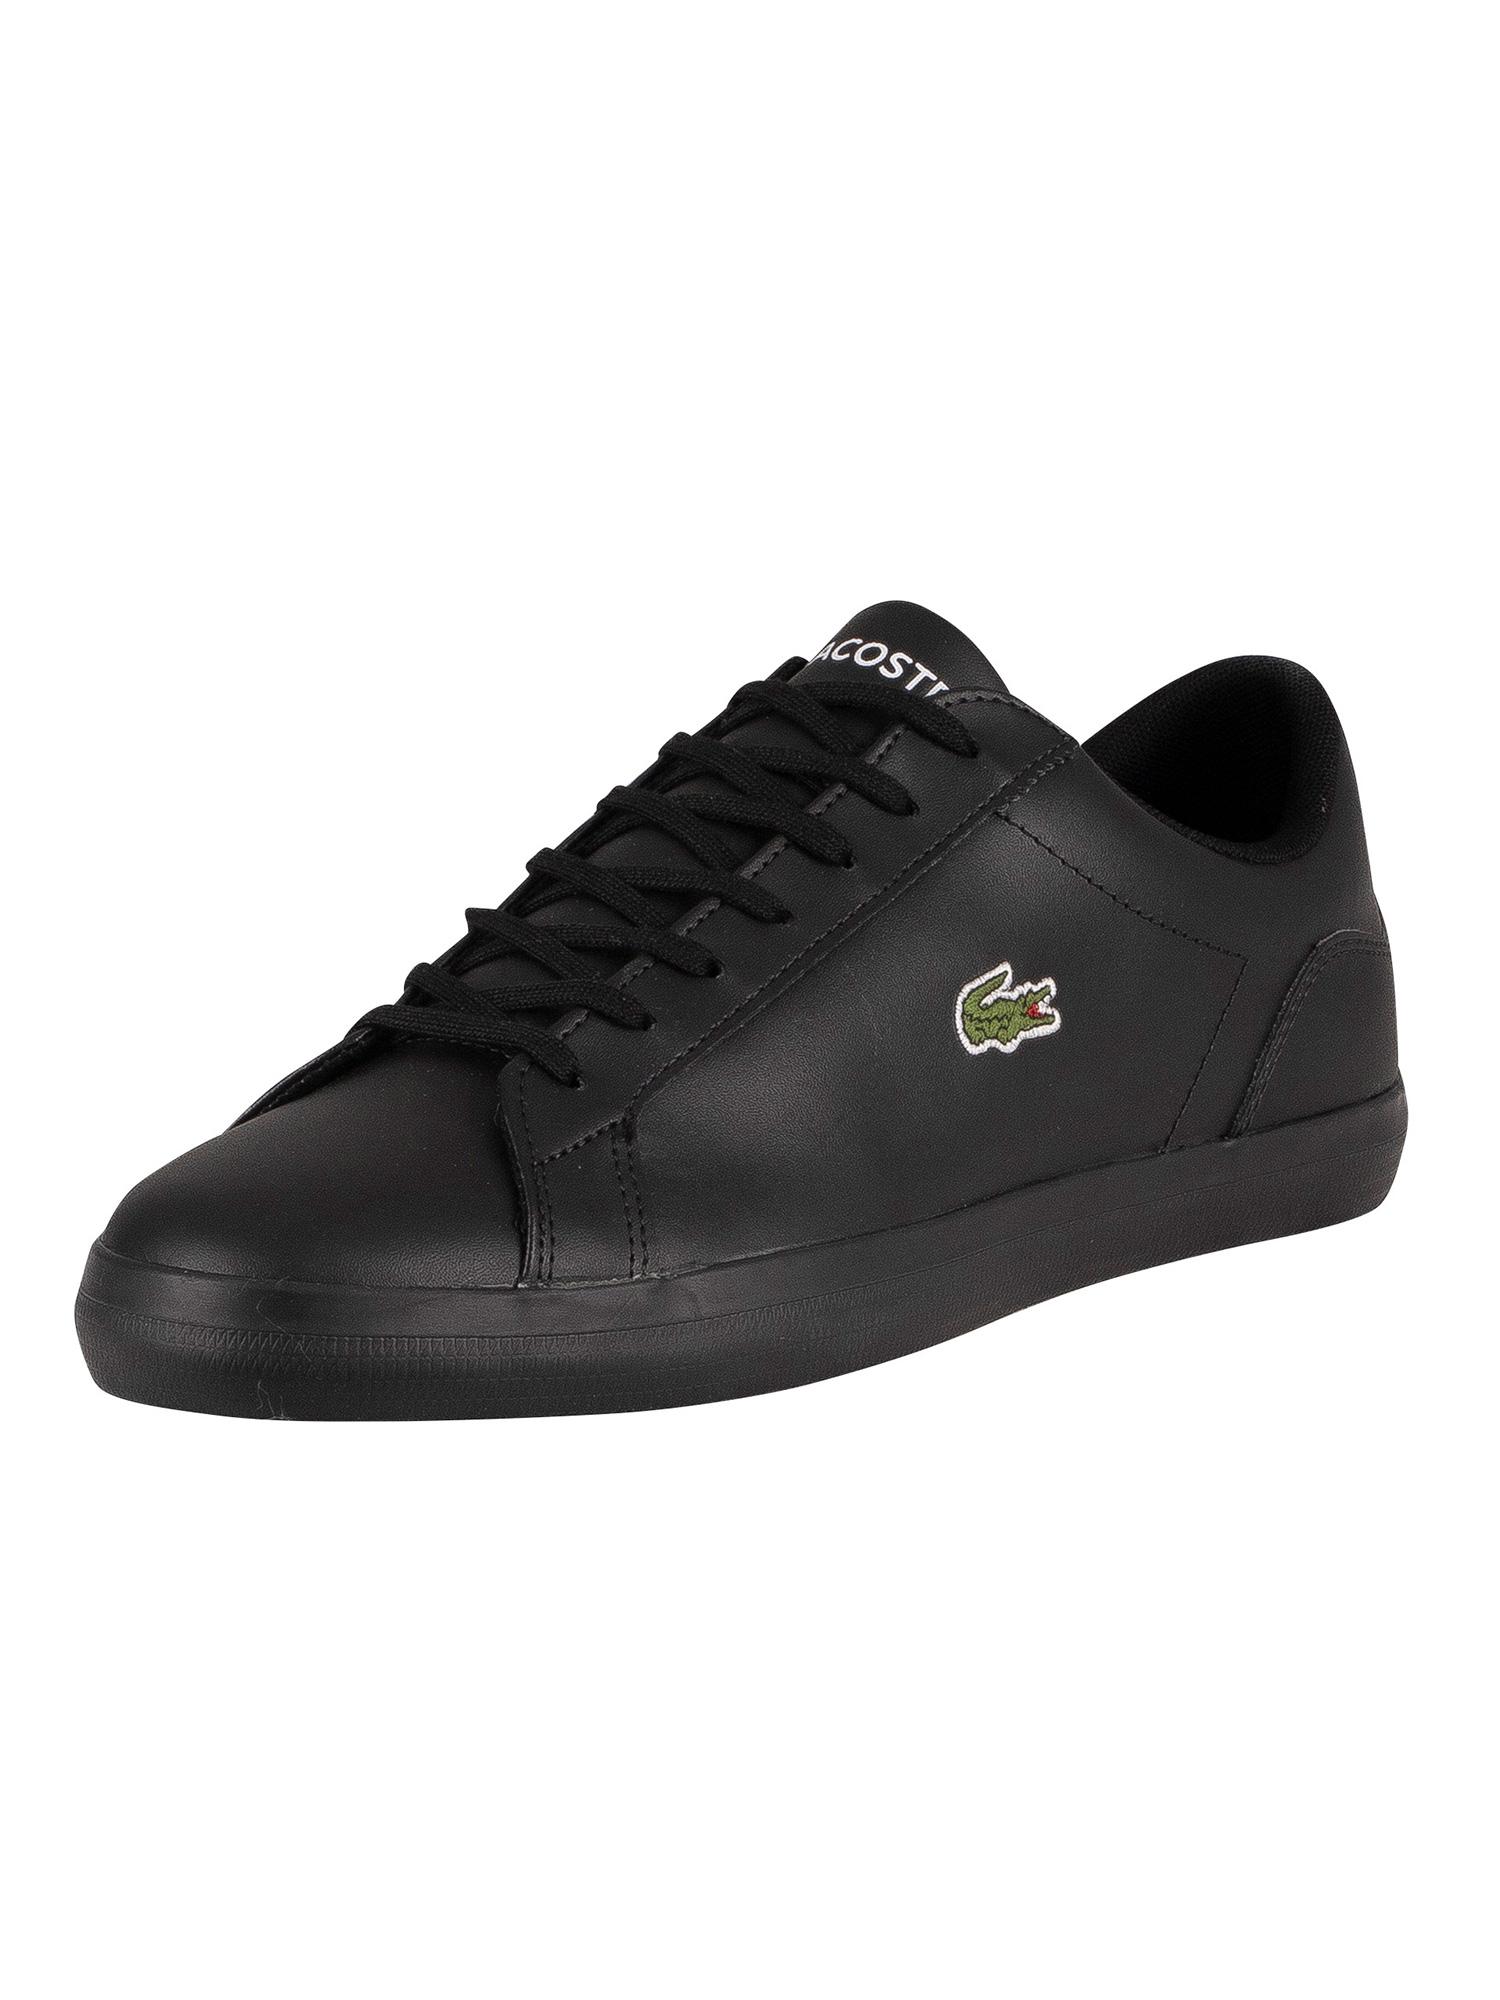 Lerond 0121 1 CMA Leather Trainers